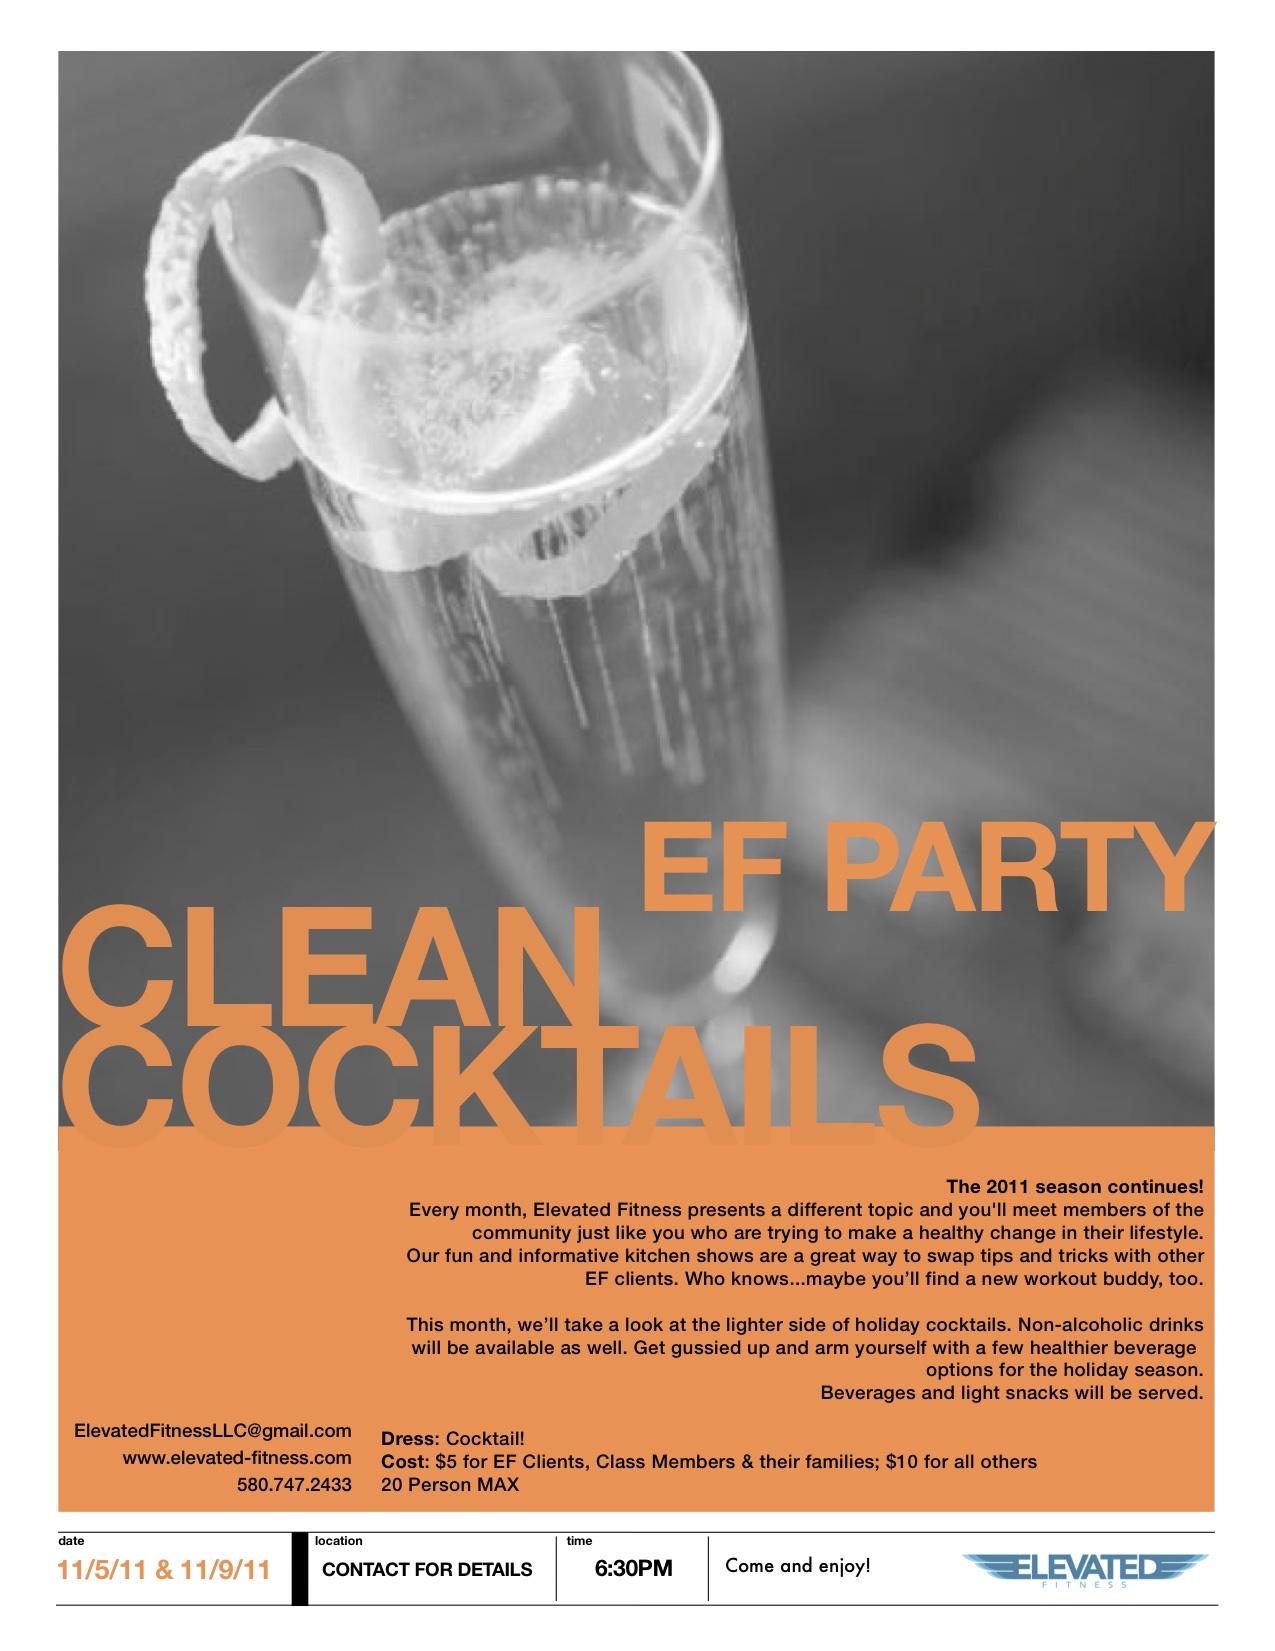 EF Party Clean Cocktails jpeg.jpg